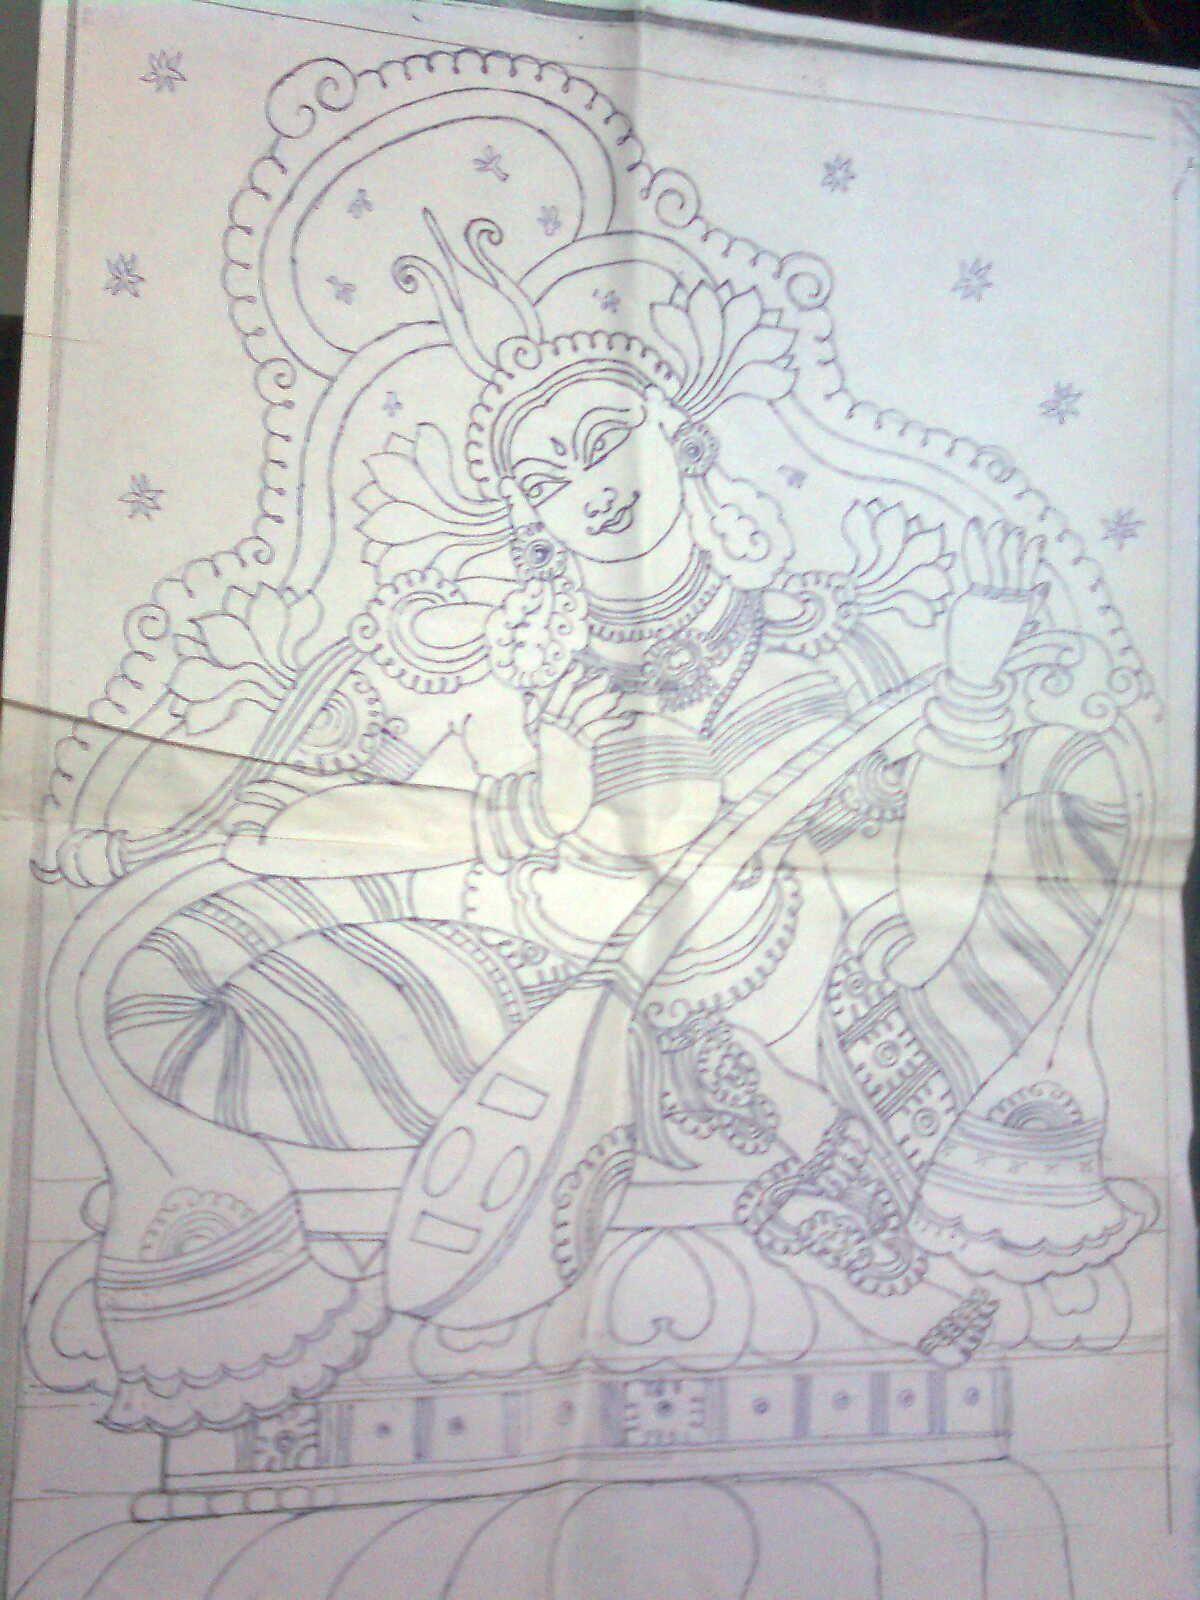 Tracing design craftziners mural paintings pinterest for Mural painting designs